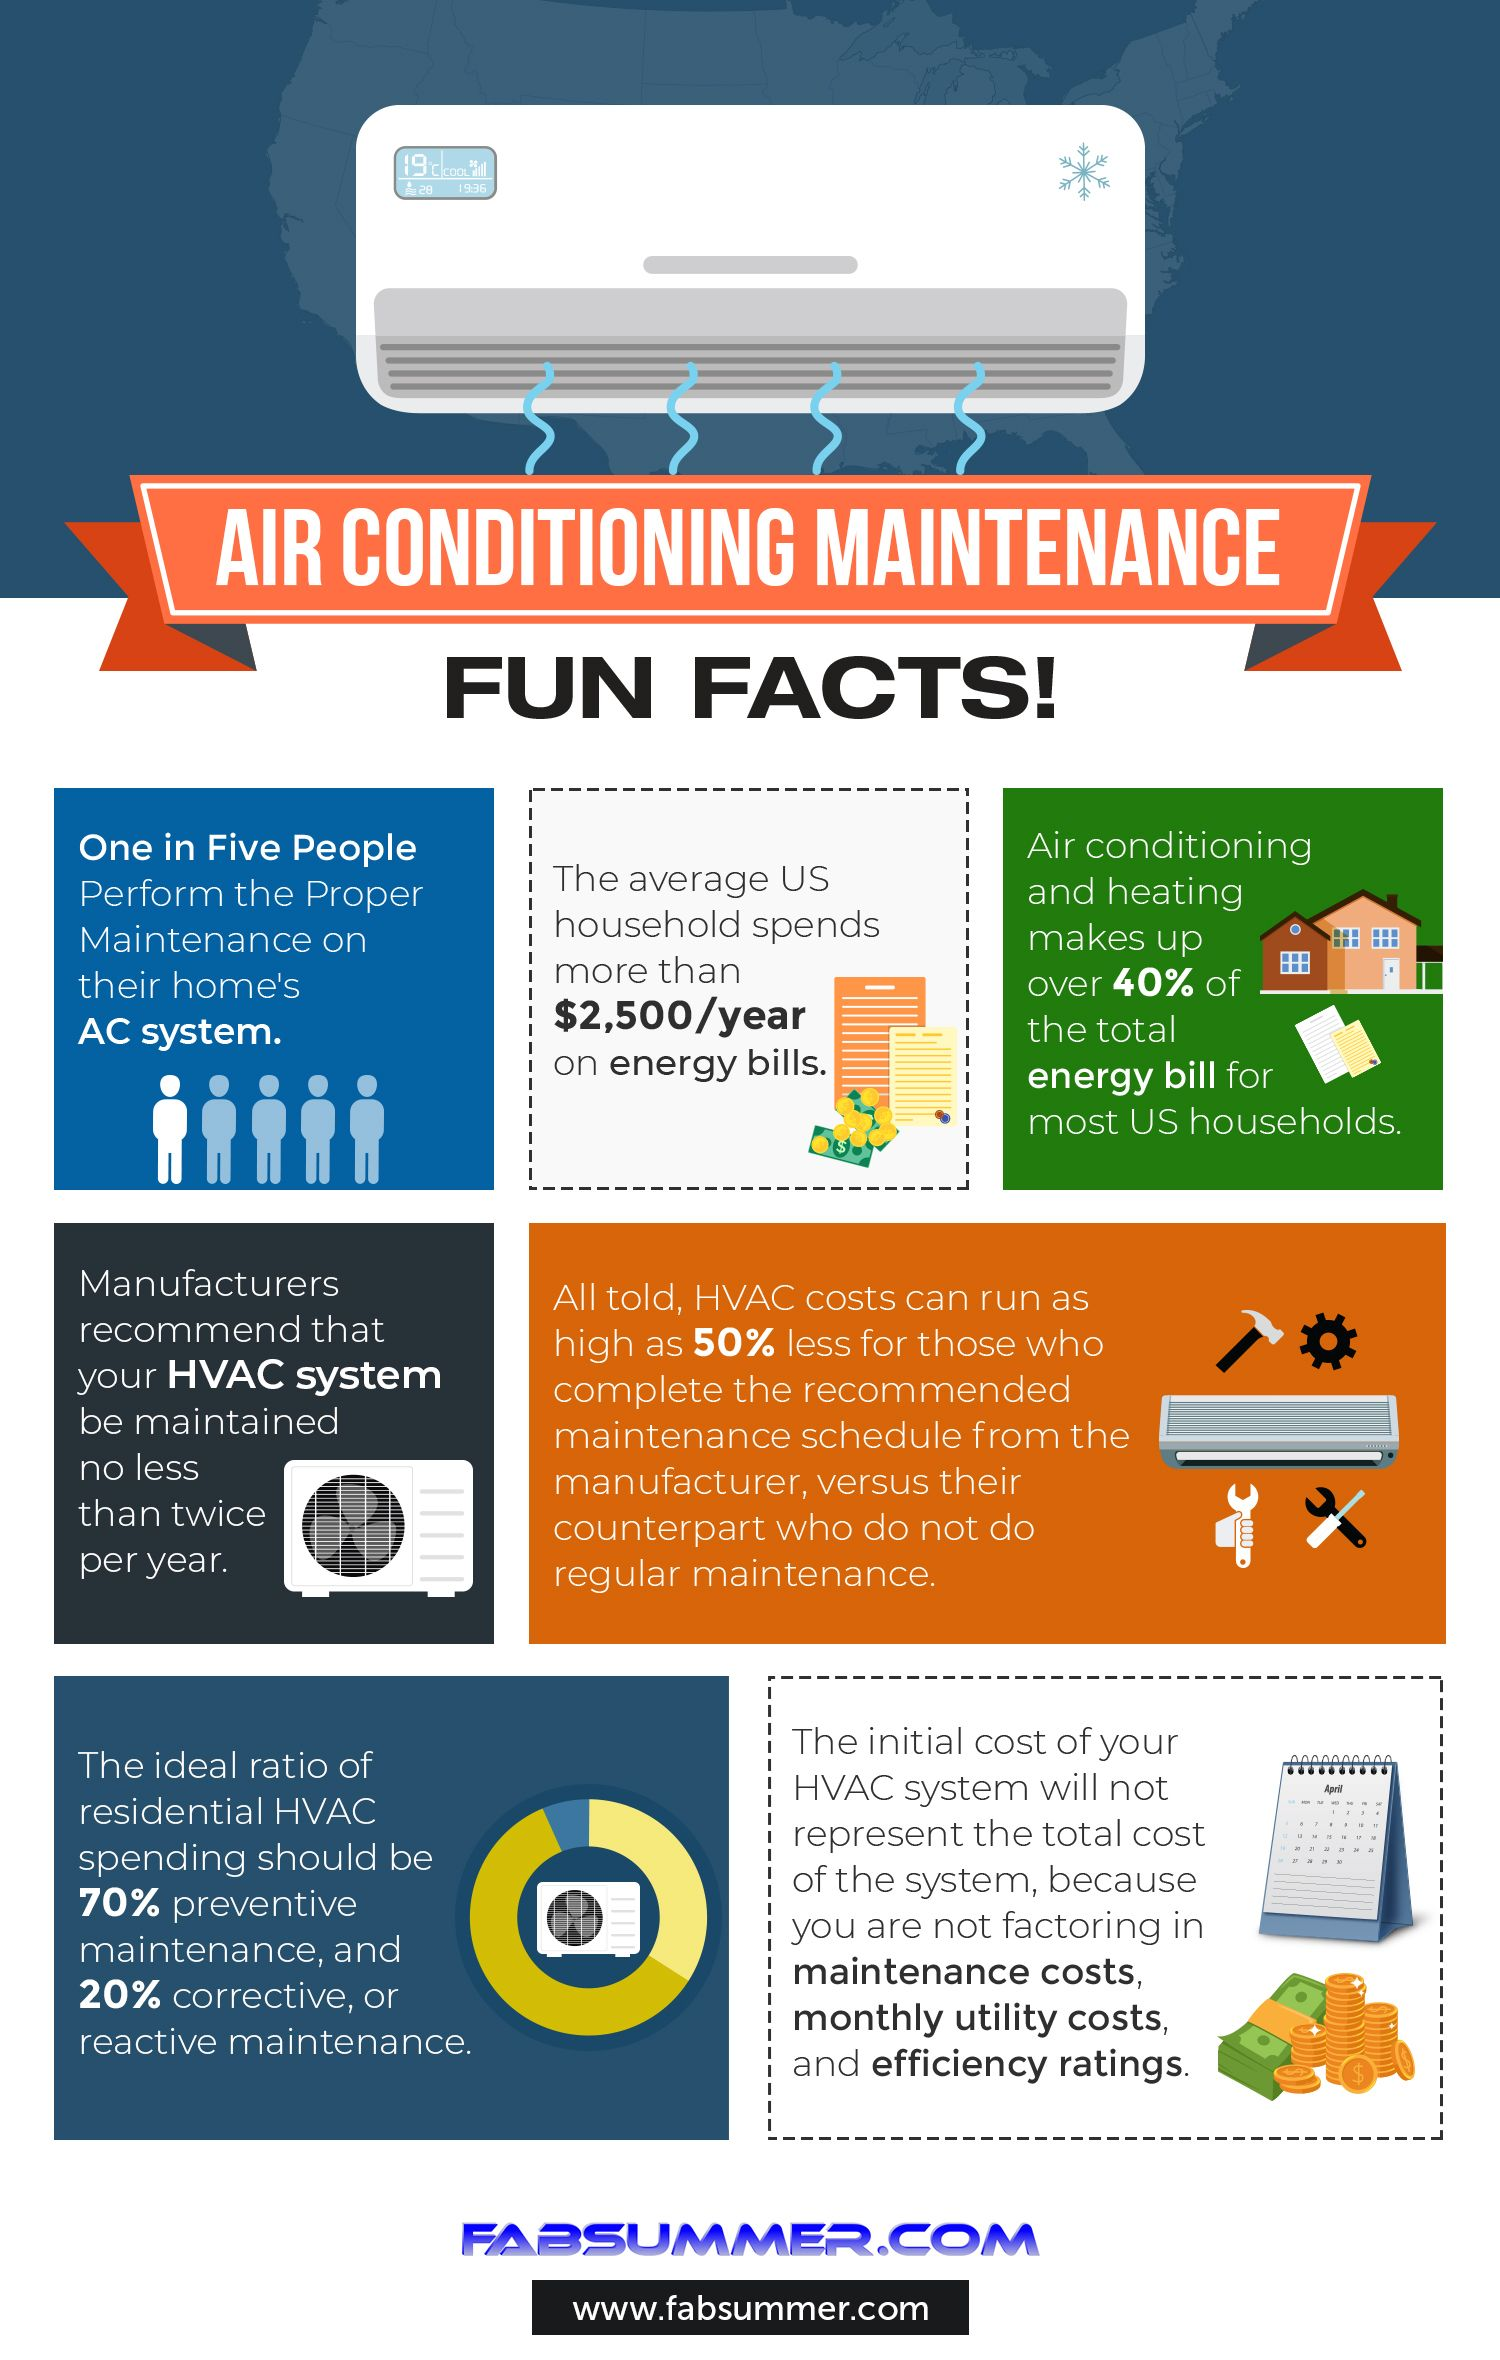 Air Conditioning Maintenance Fun Facts! Air